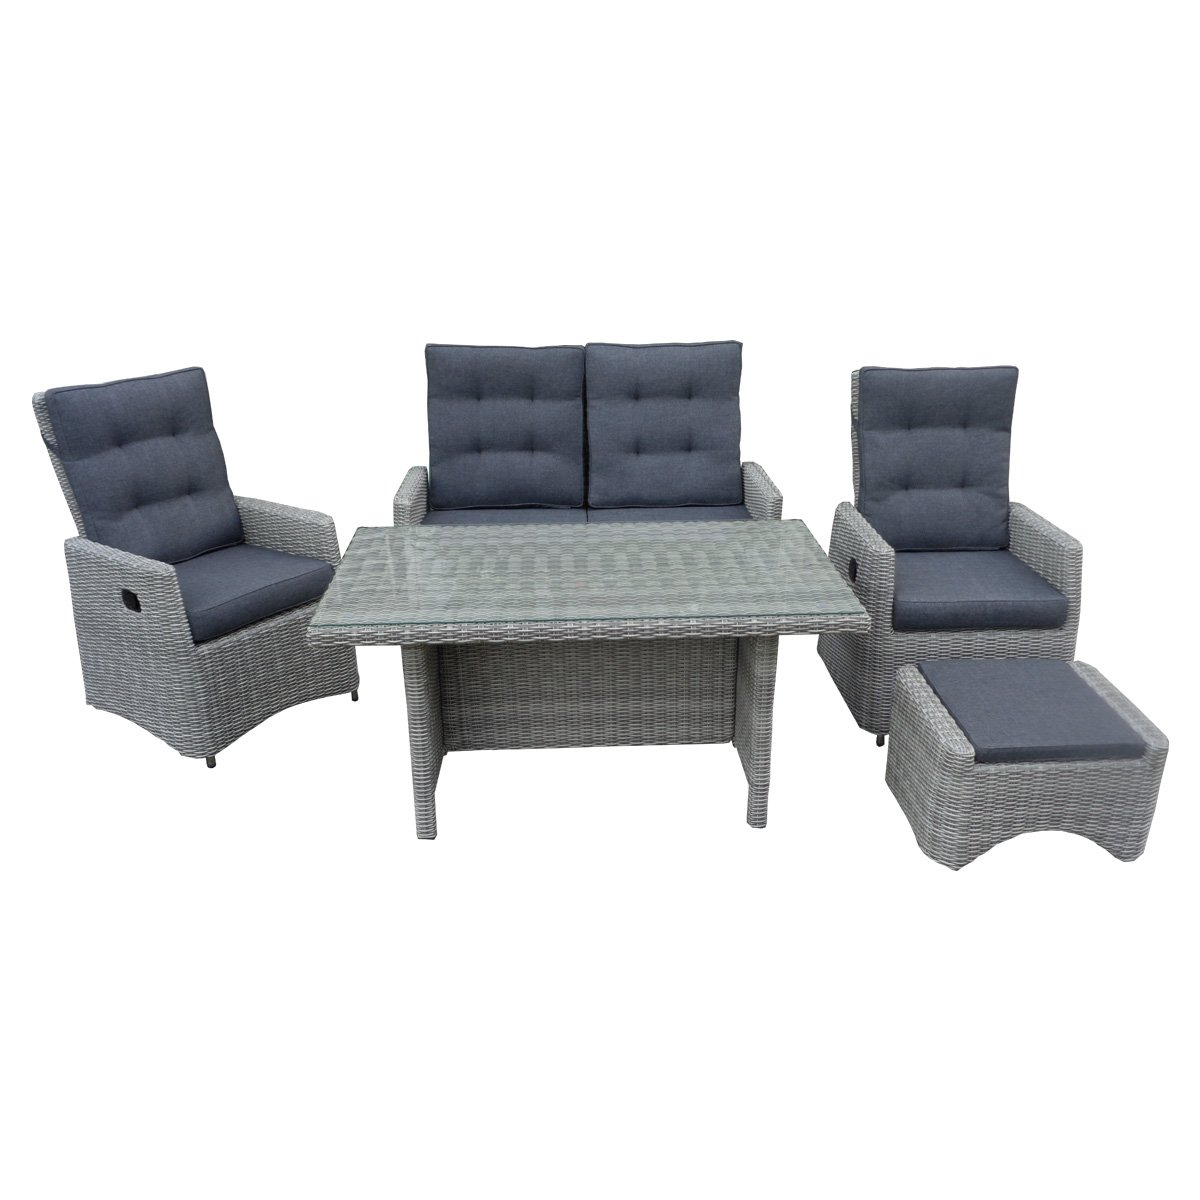 sofa bestellen affordable innovation schlafsofa hermod sofa online bestellen sitzdesign. Black Bedroom Furniture Sets. Home Design Ideas